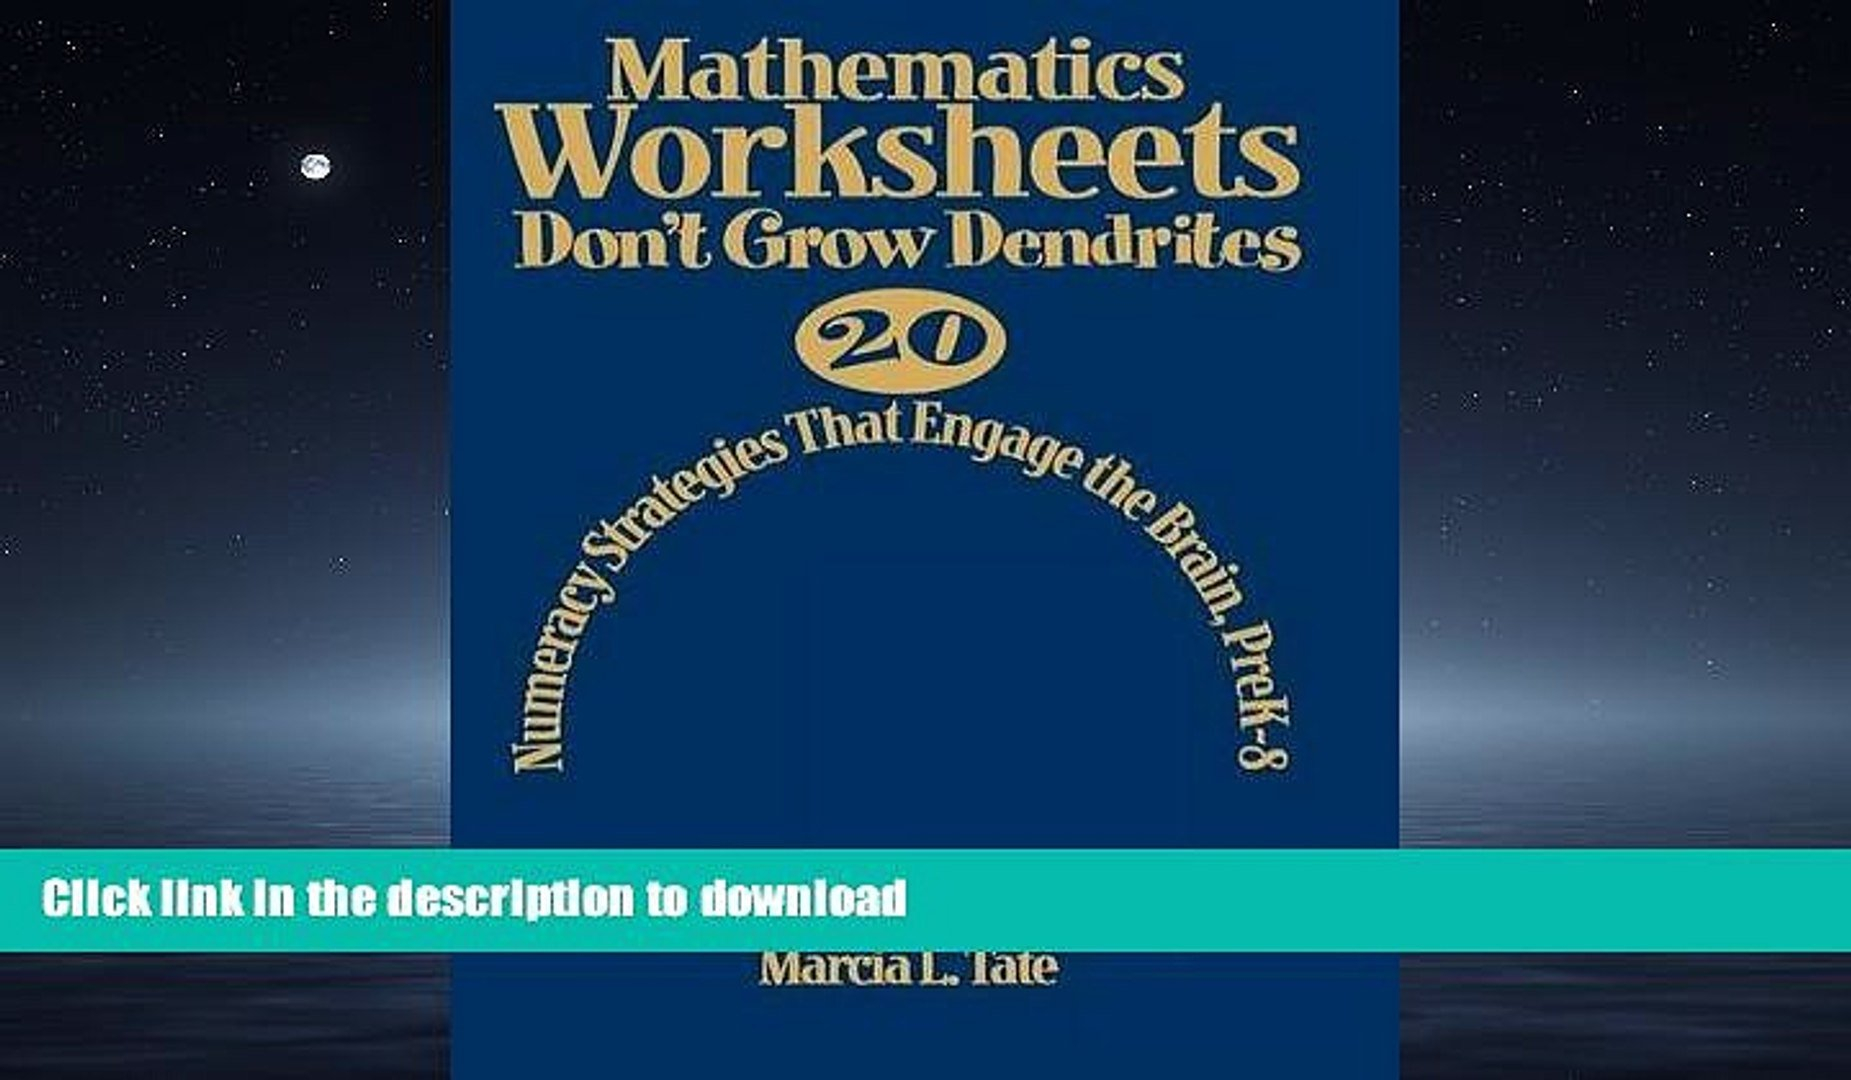 Read Mathematics Worksheets Don T Grow Dendrites 20 Numeracy Regarding Worksheets Don T Grow Dendrites Pdf